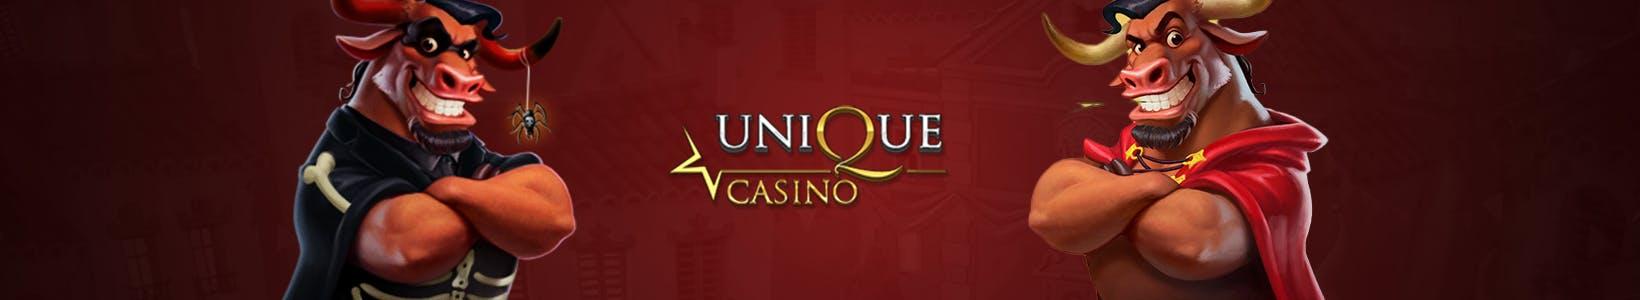 banniere de promotion originale kagino fr unique casino